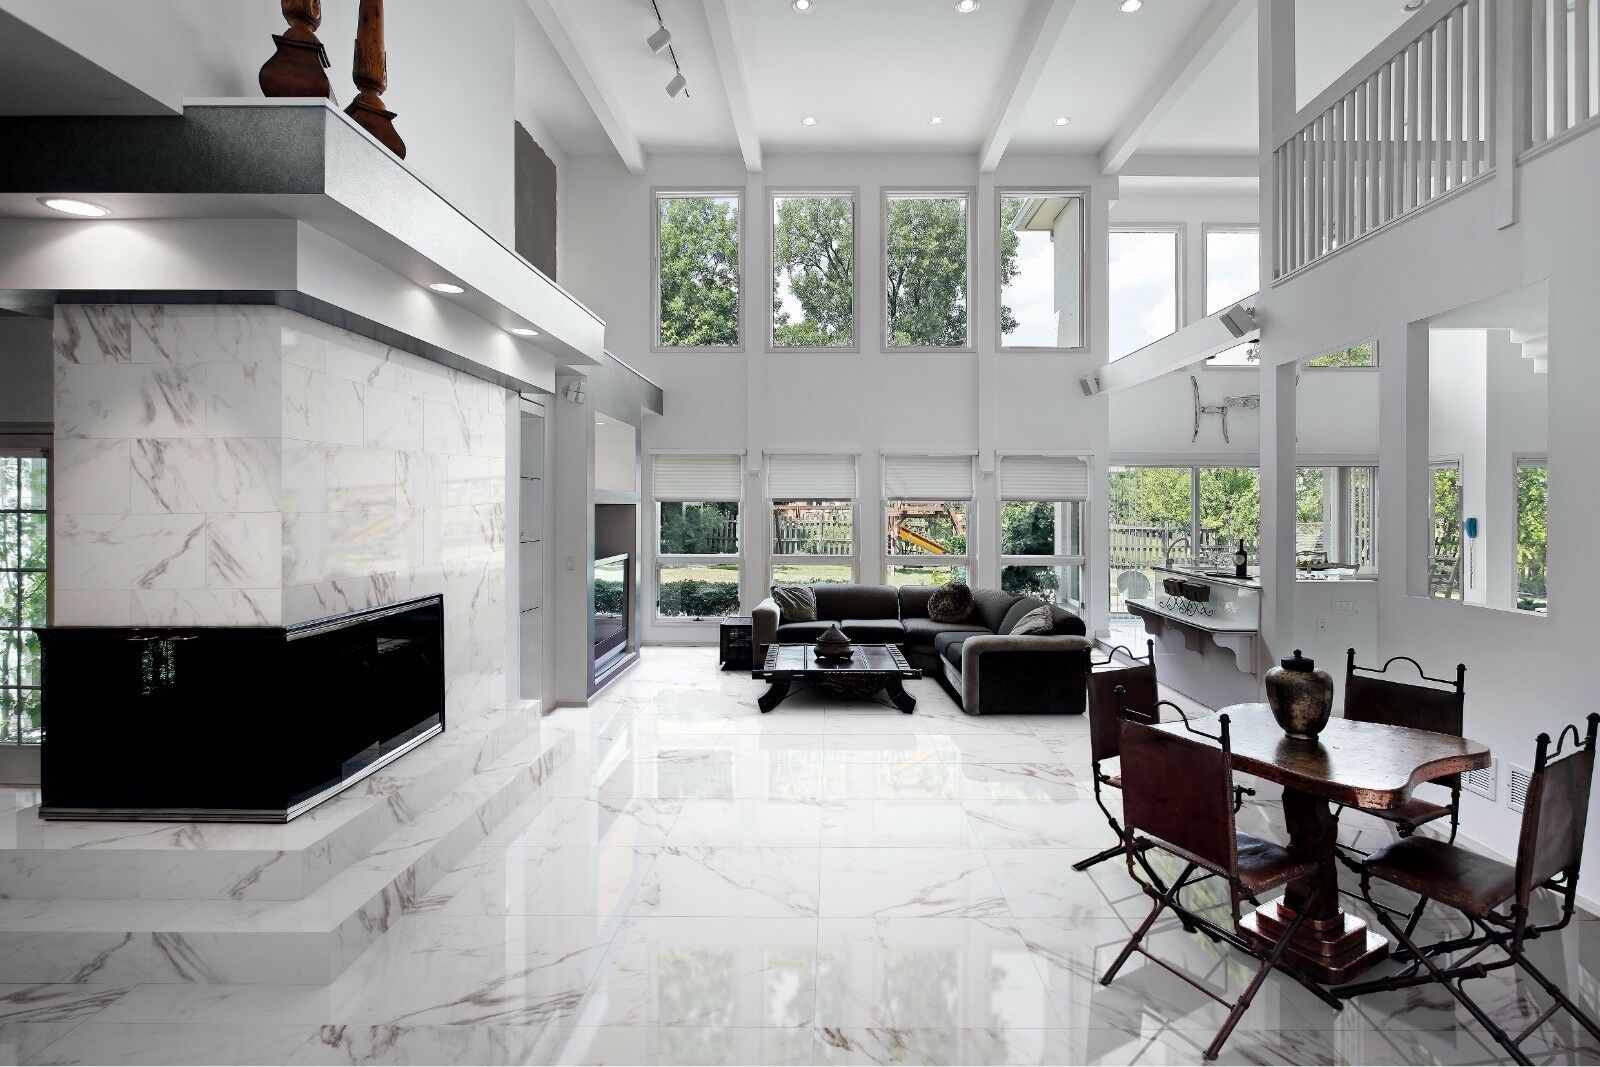 TILES JOBLOT 83: 83: 83: Braun & Weiß marble look polished porcelain tiles 60x60 30m2 981c86